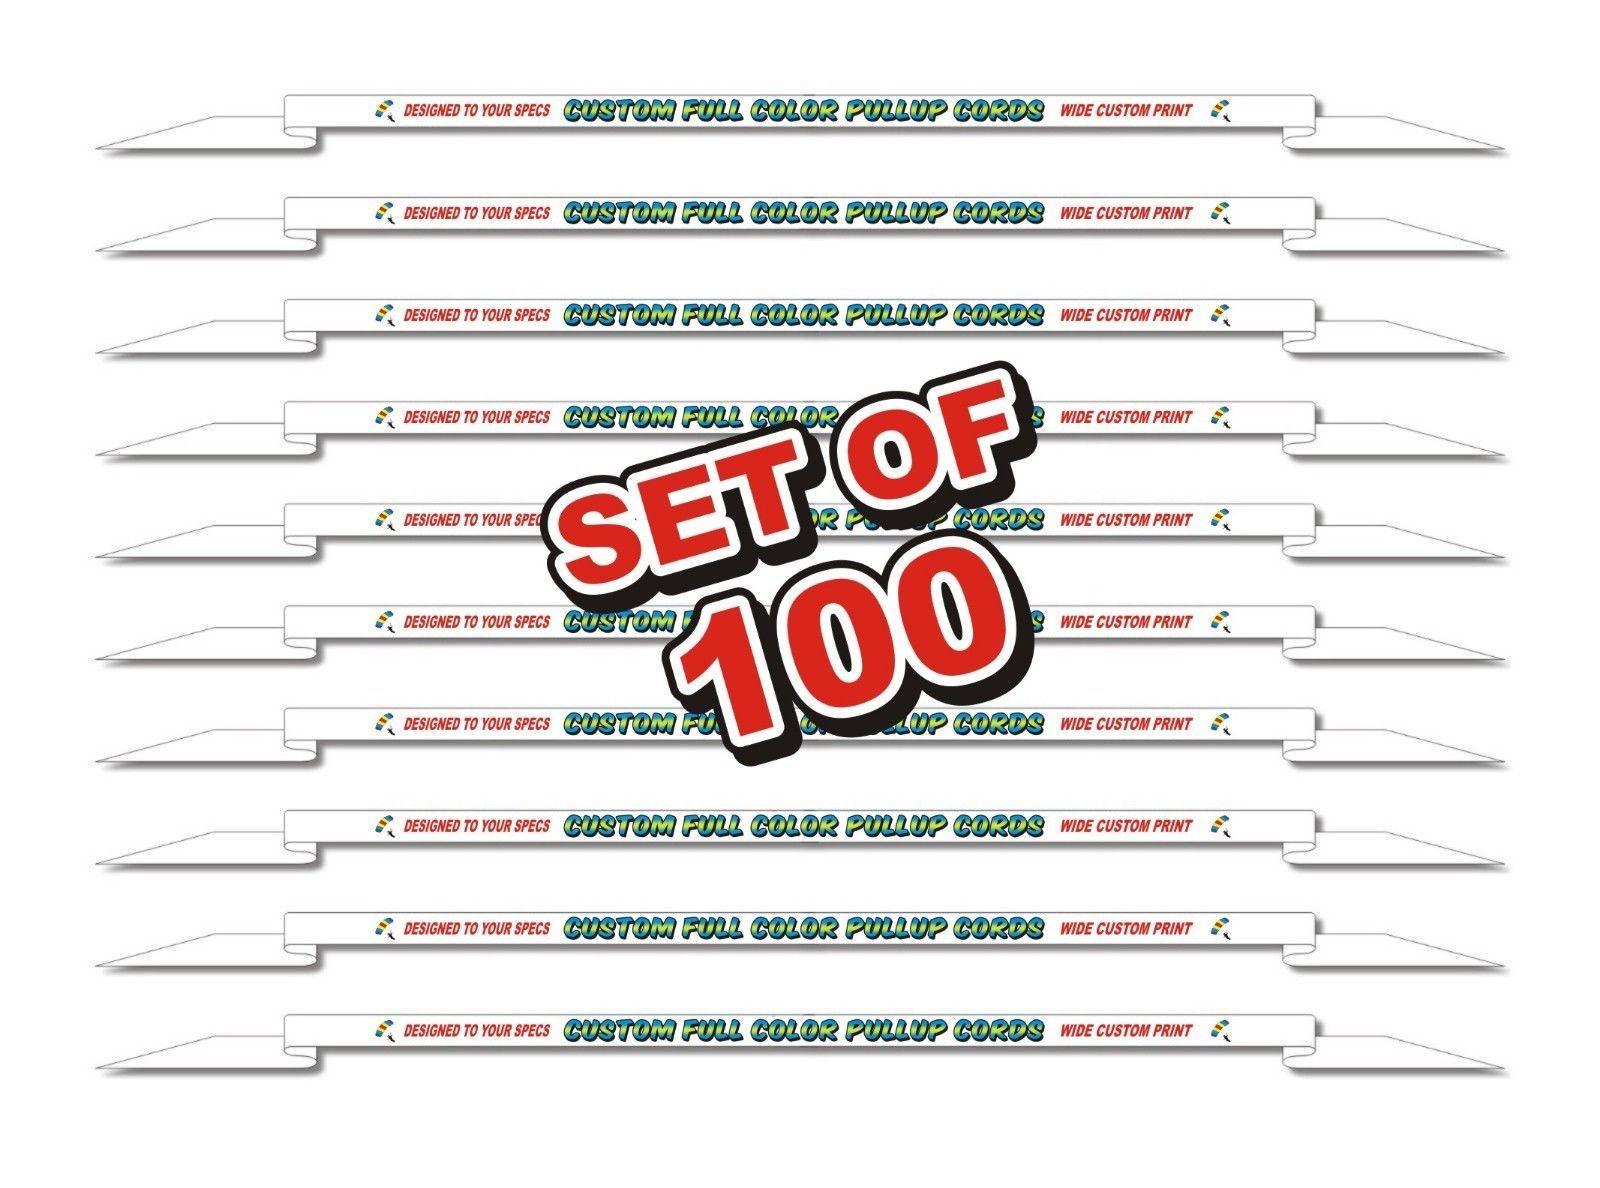 Skydiving Custom Pull Up Cords Full Color Set Of 100 Designed For You Ebay Color Set Design Custom